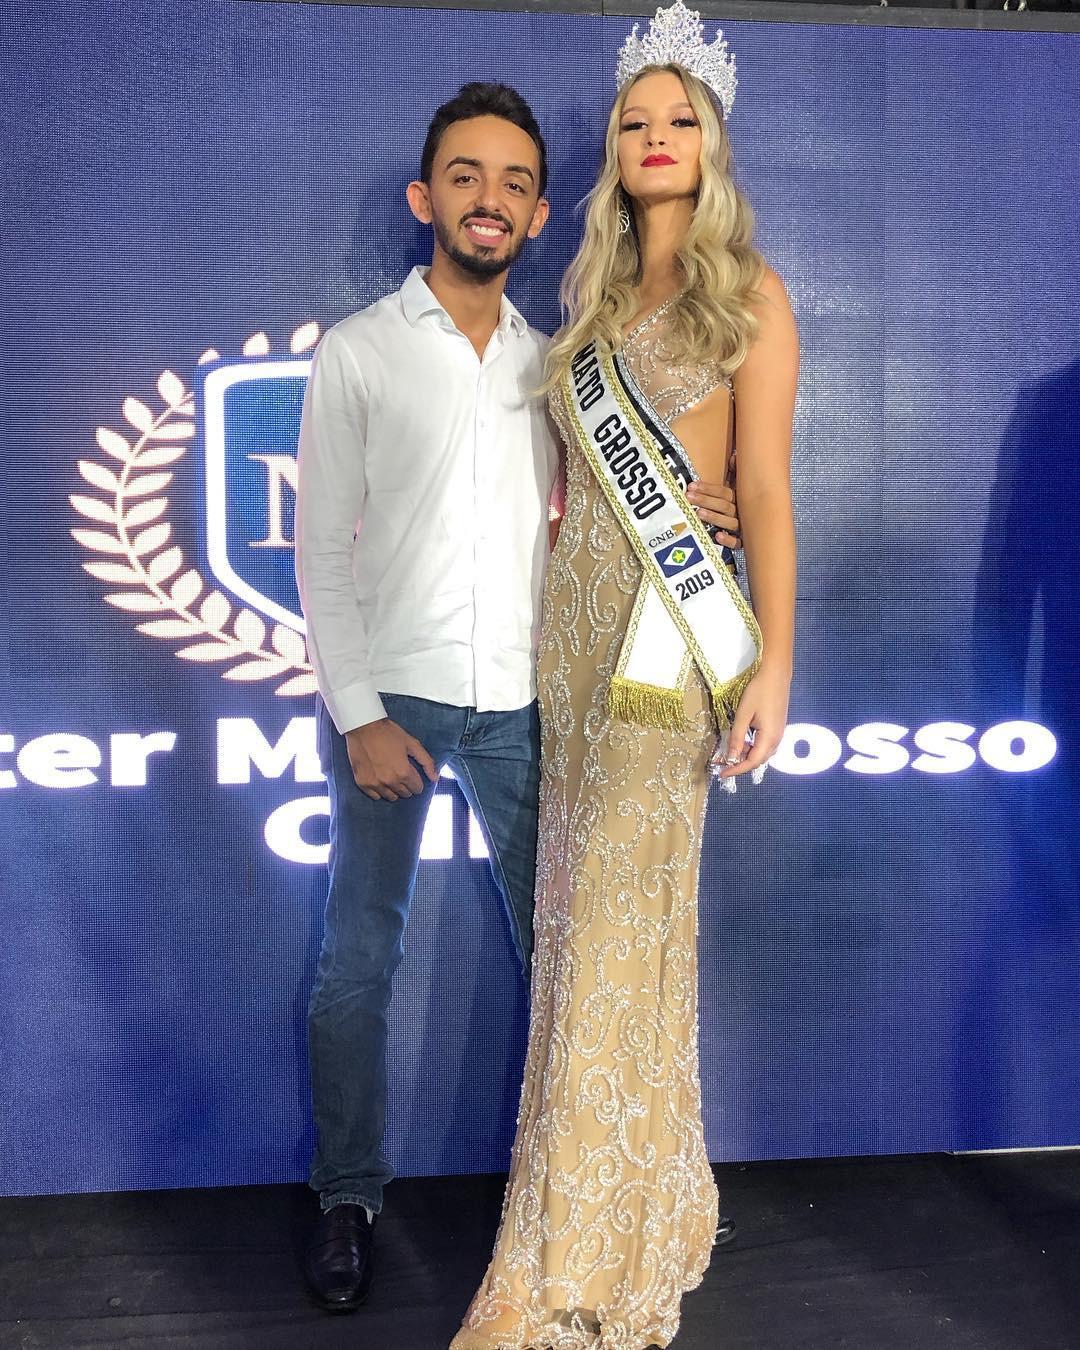 larissa neiverth, top 20 de miss brasil mundo 2019. - Página 5 Qgmqwu10